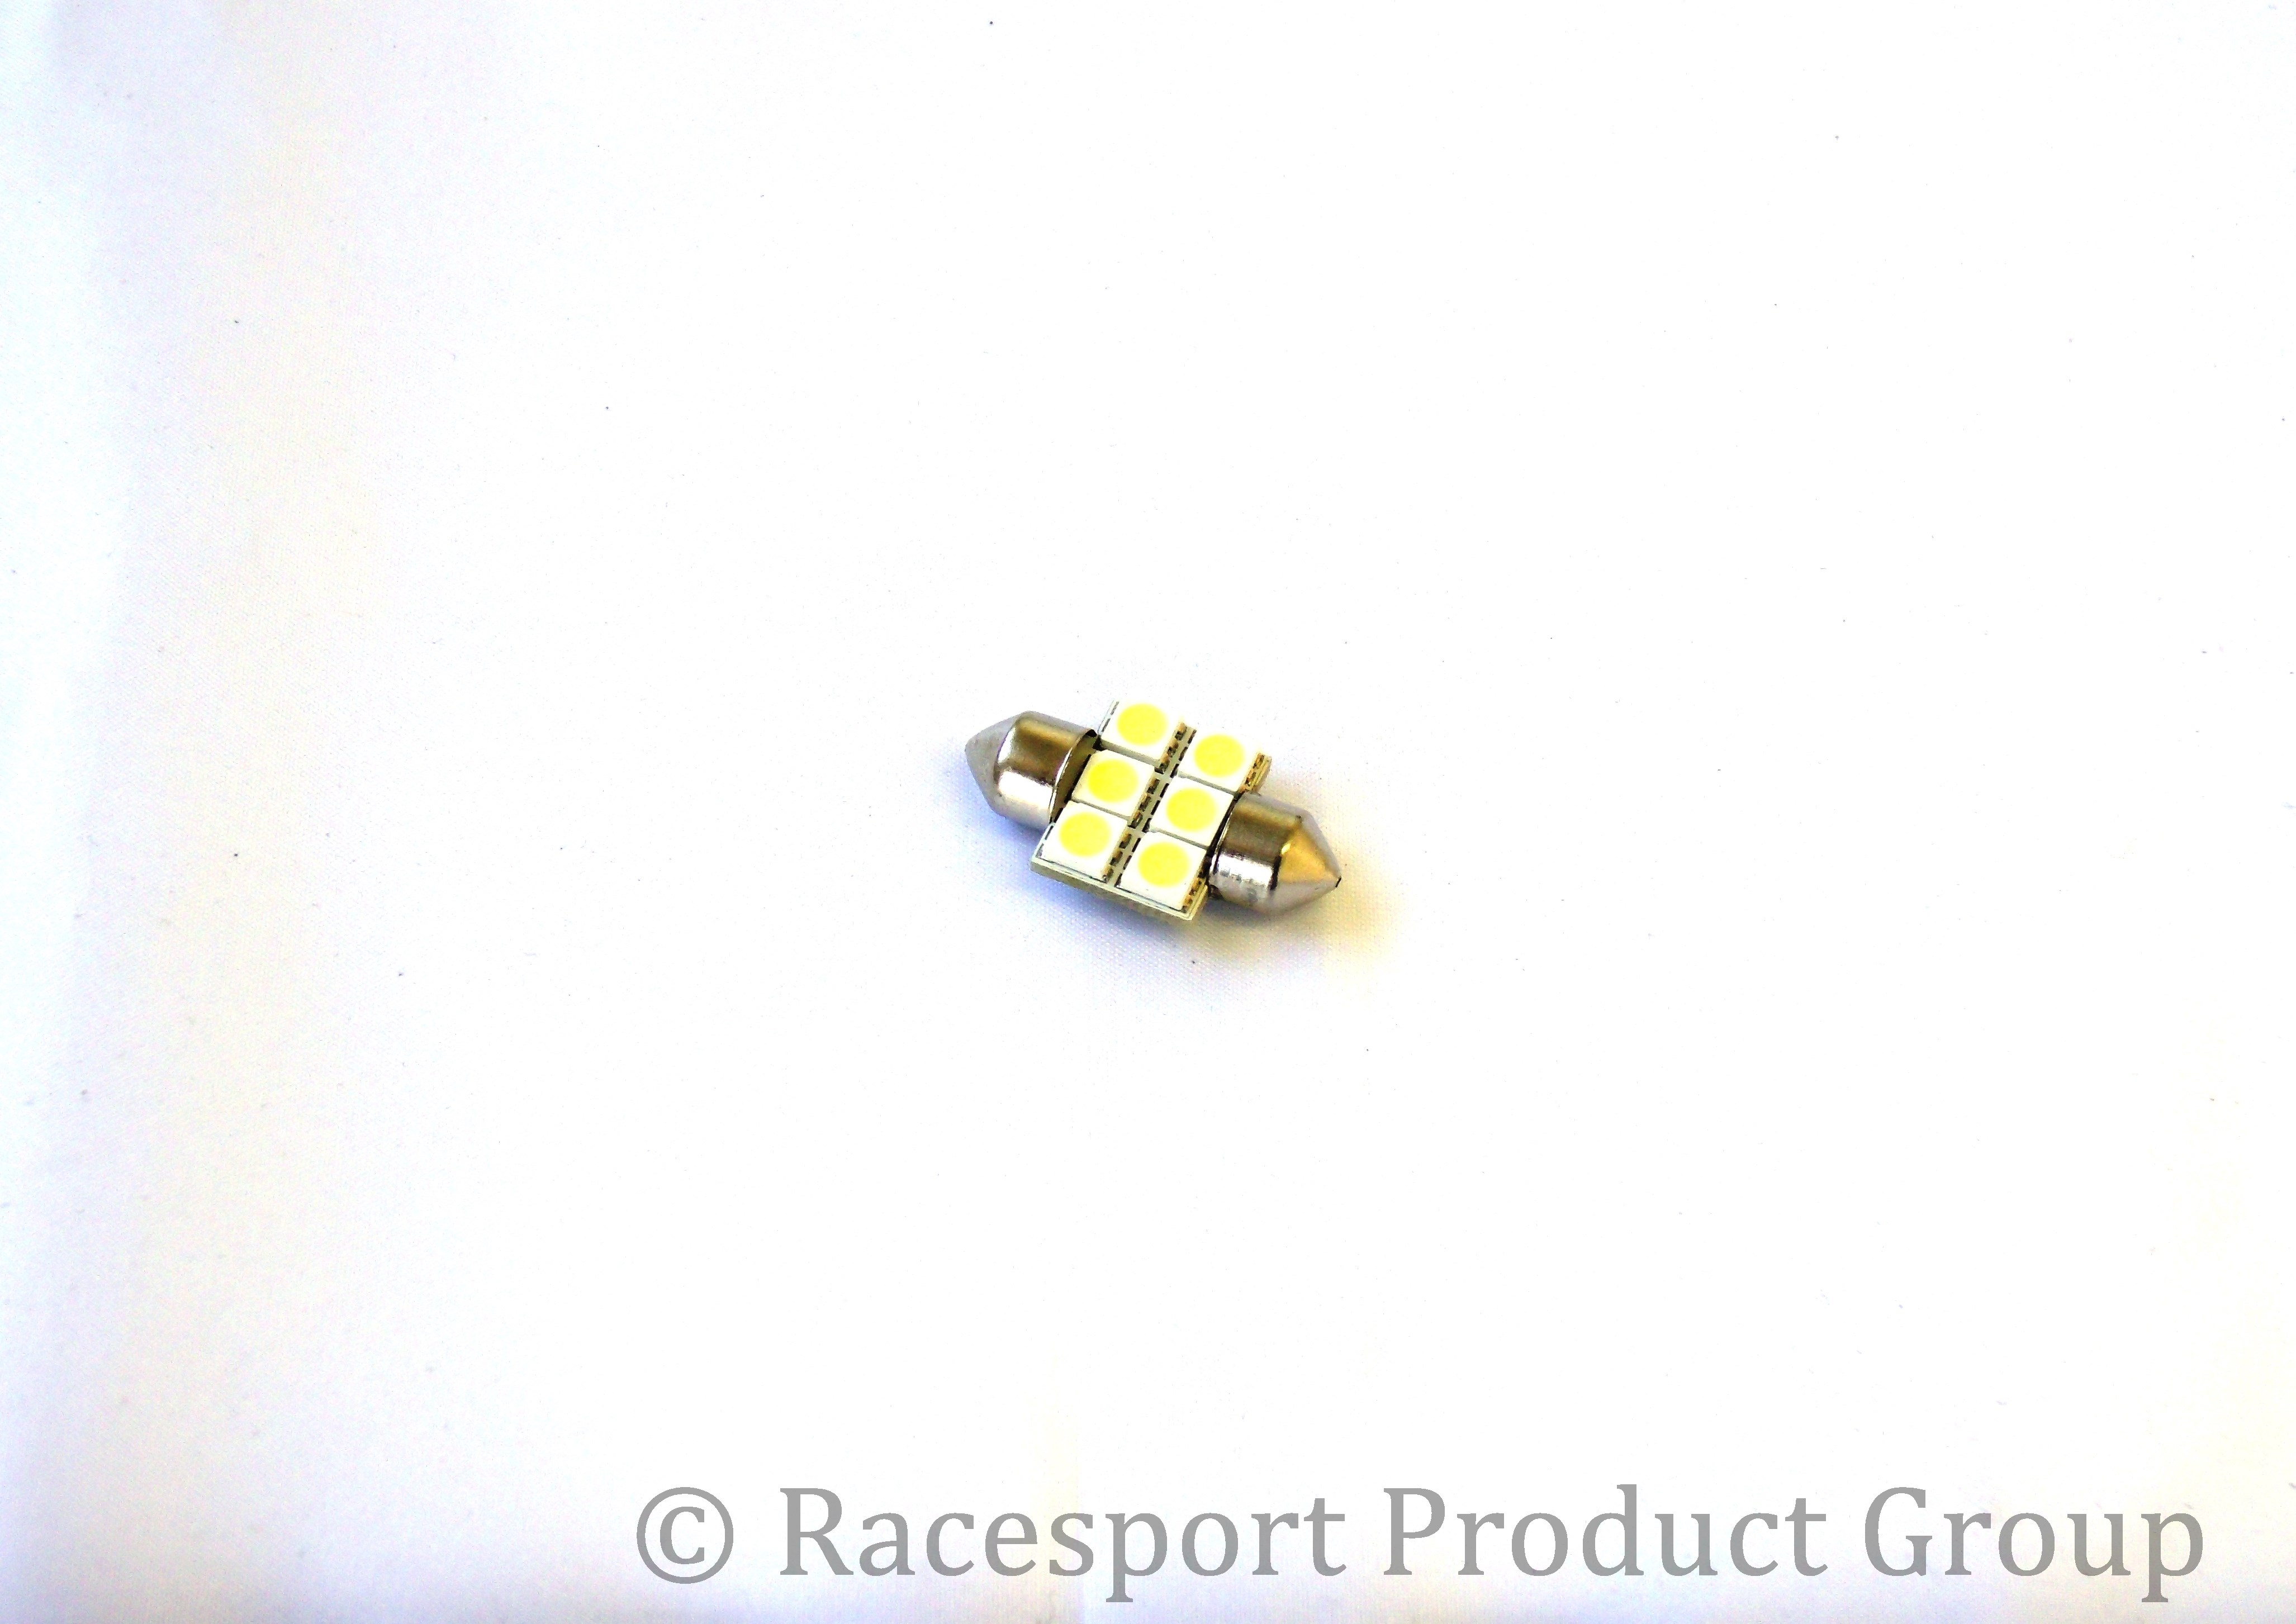 Race Sport Lighting RS-31mm-R-5050 31mm LED 6 Chip Bulbs - each Red